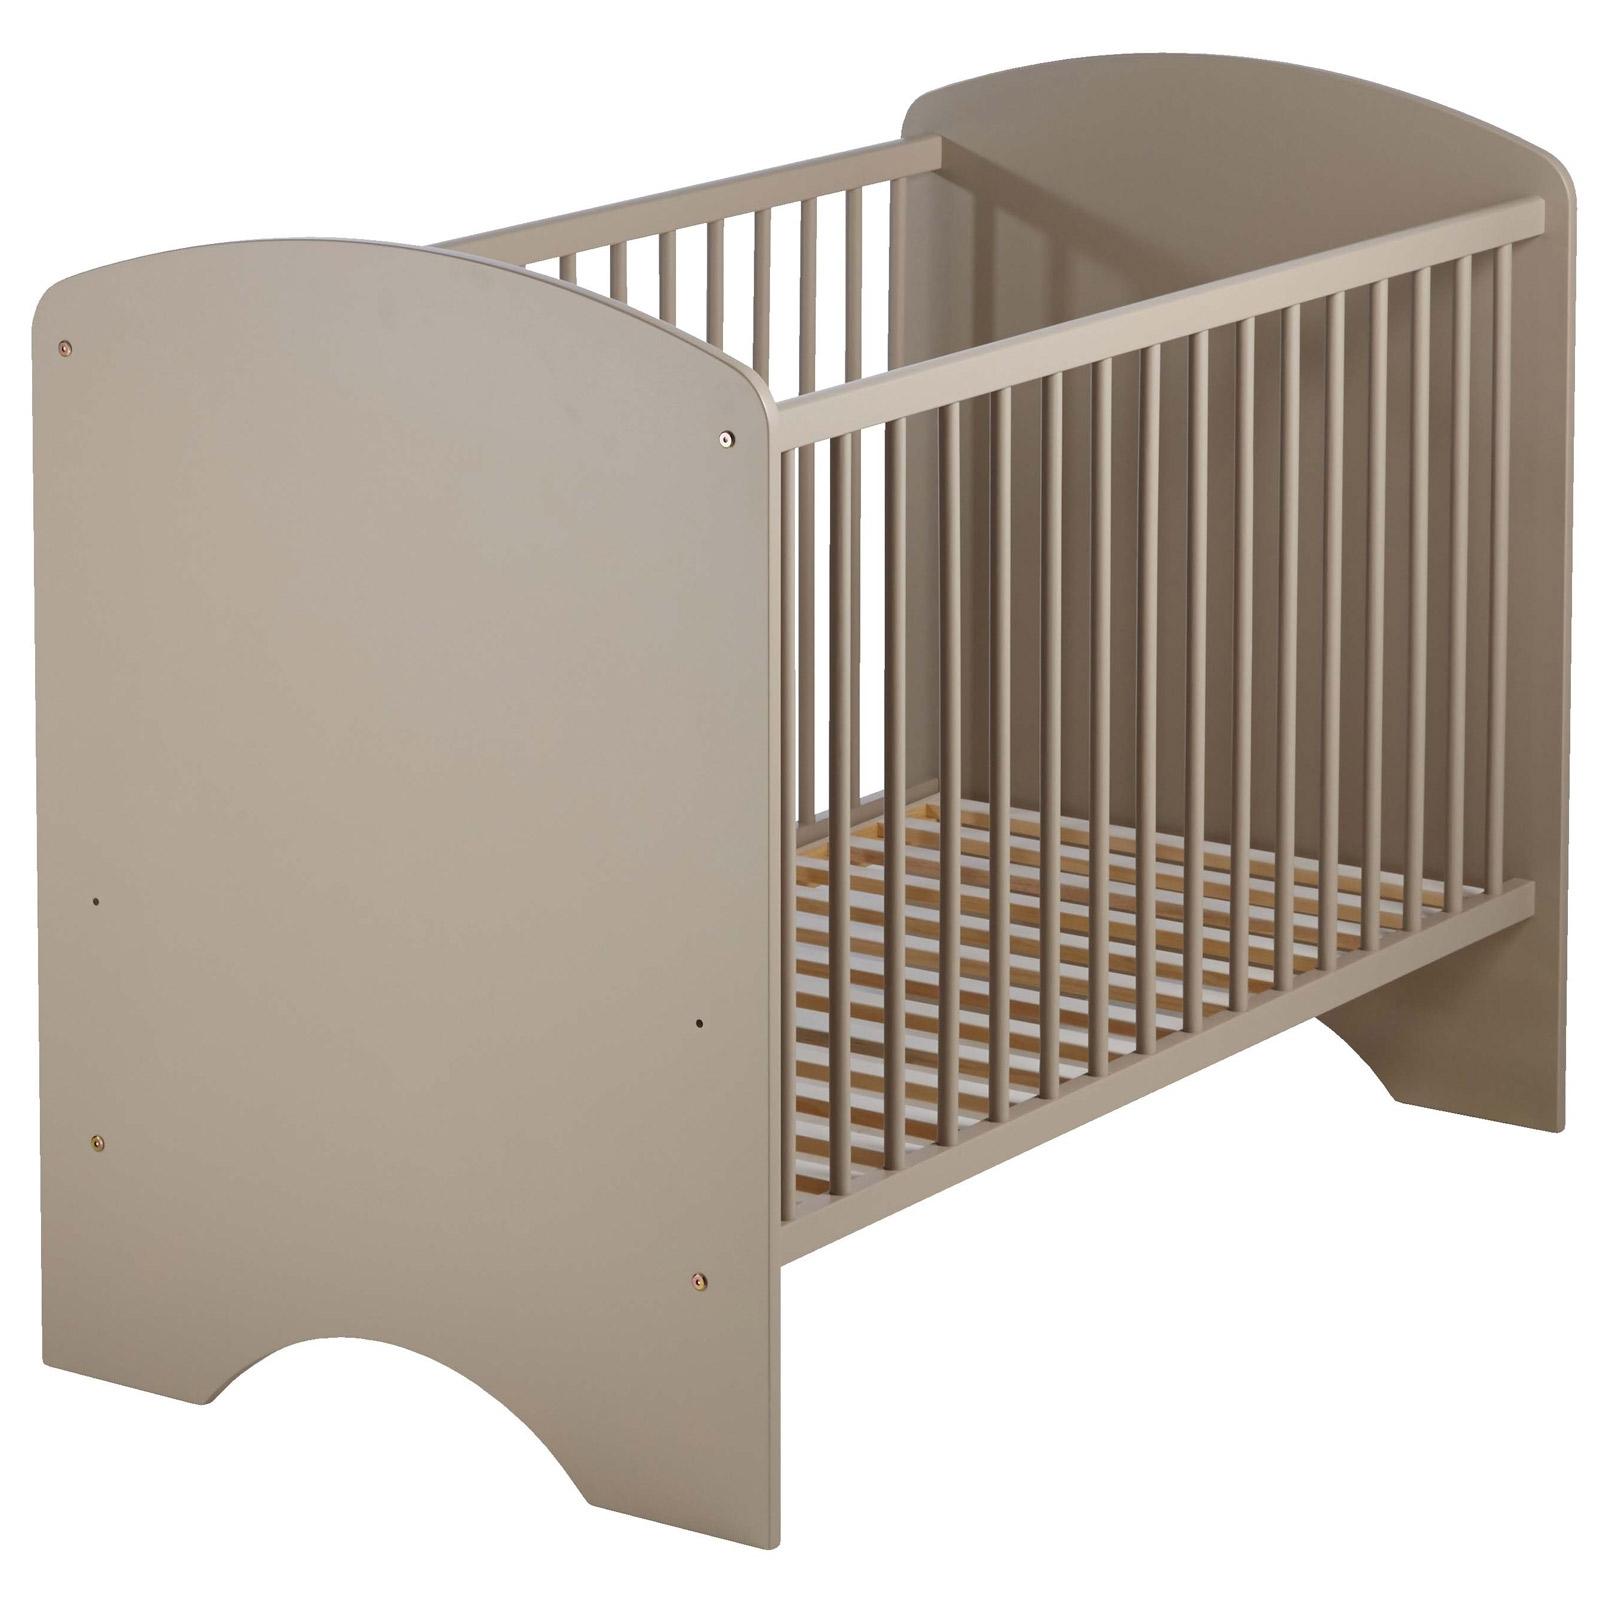 lit barreaux taupe sweety 60. Black Bedroom Furniture Sets. Home Design Ideas